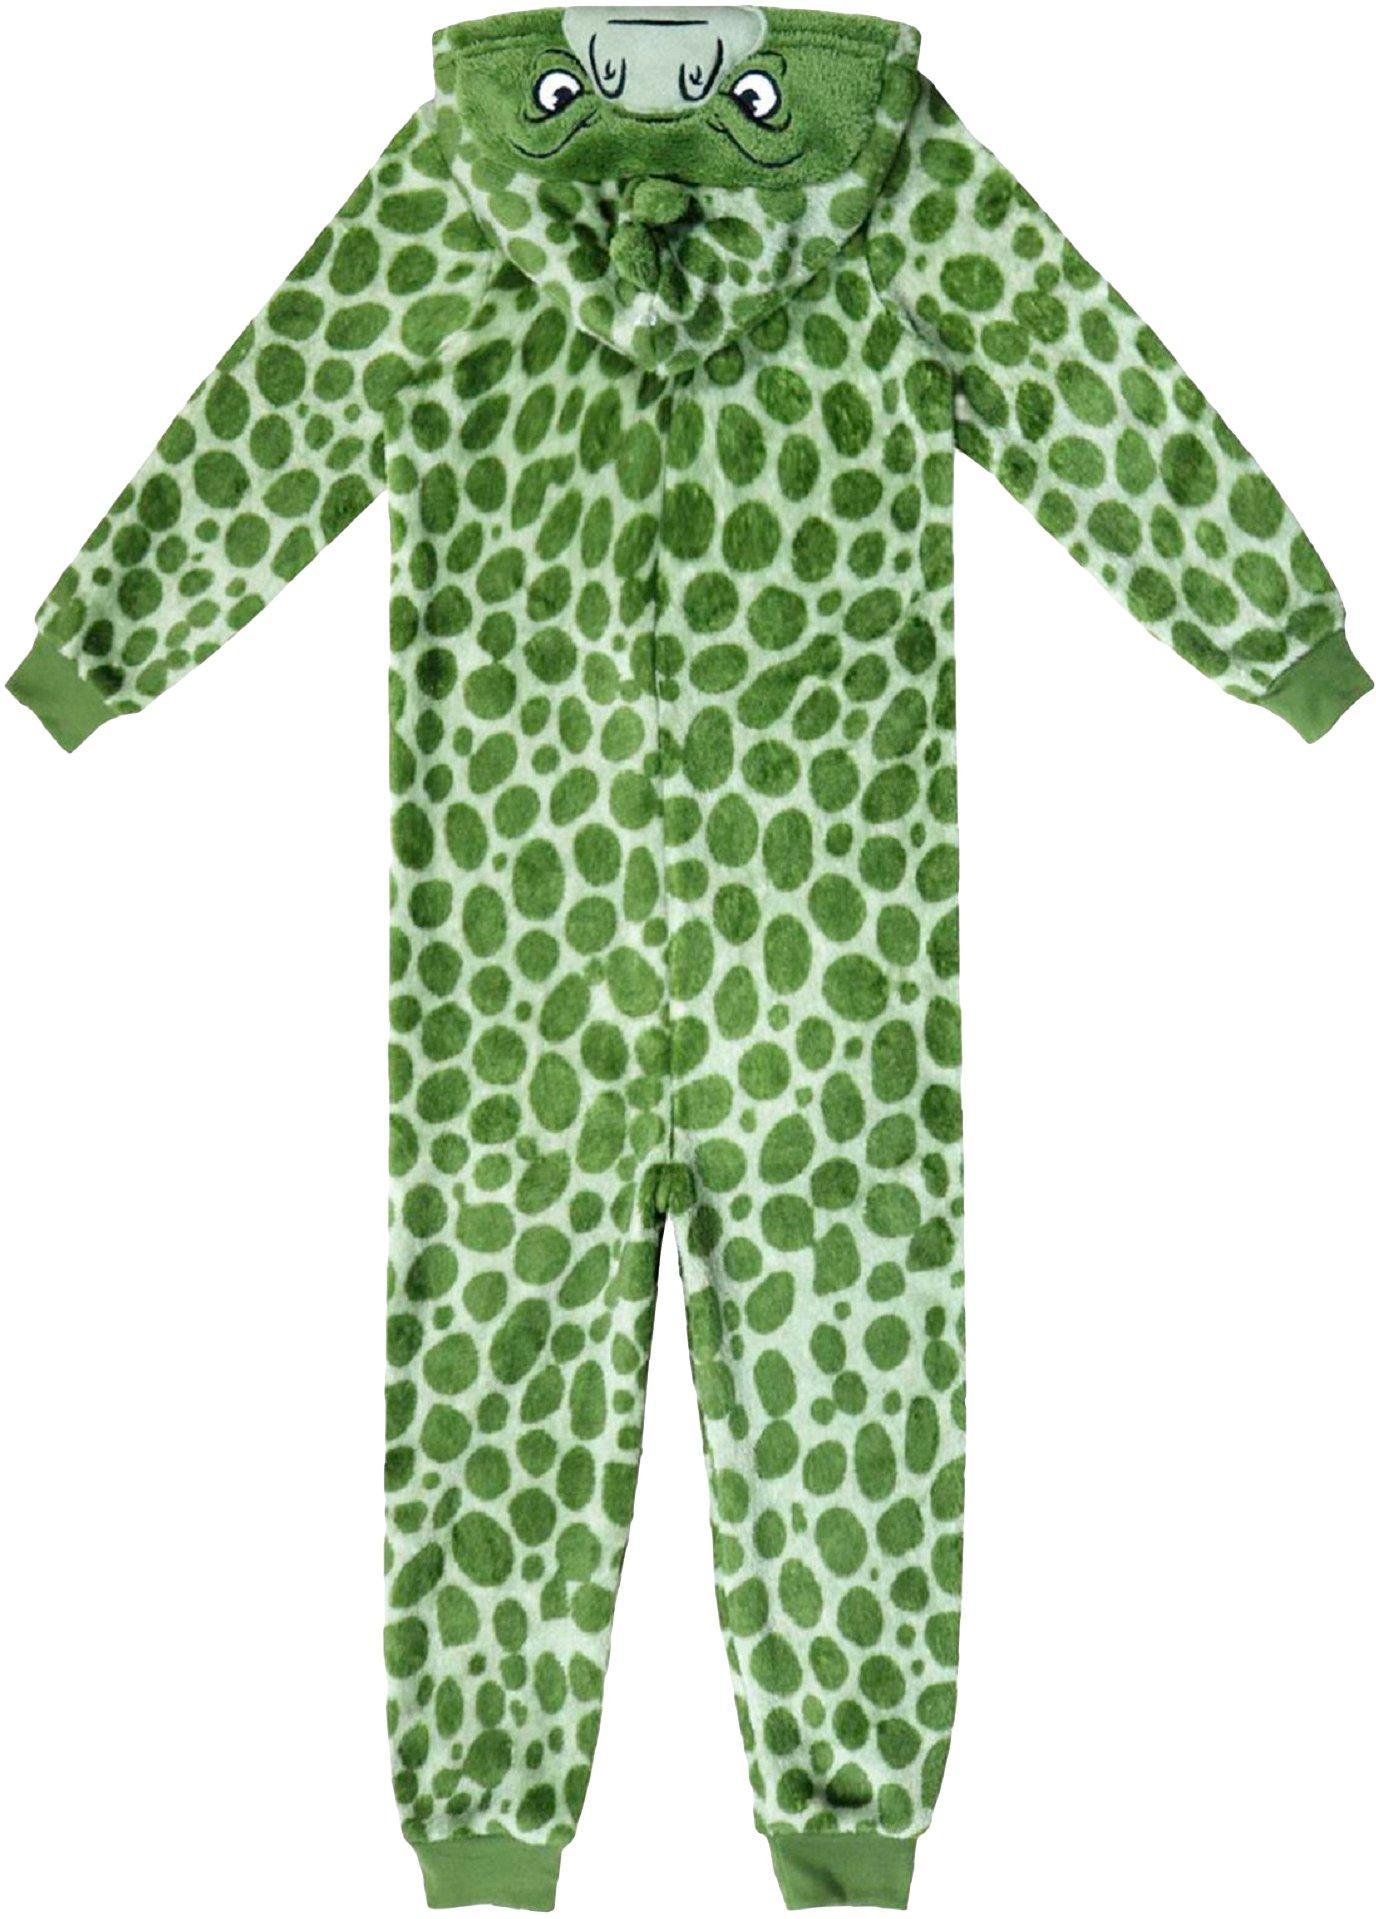 Shark Pajamas Size 6,8,10//12 L,14//16 XL Boy Blanket Sleeper One Piece Union Suit